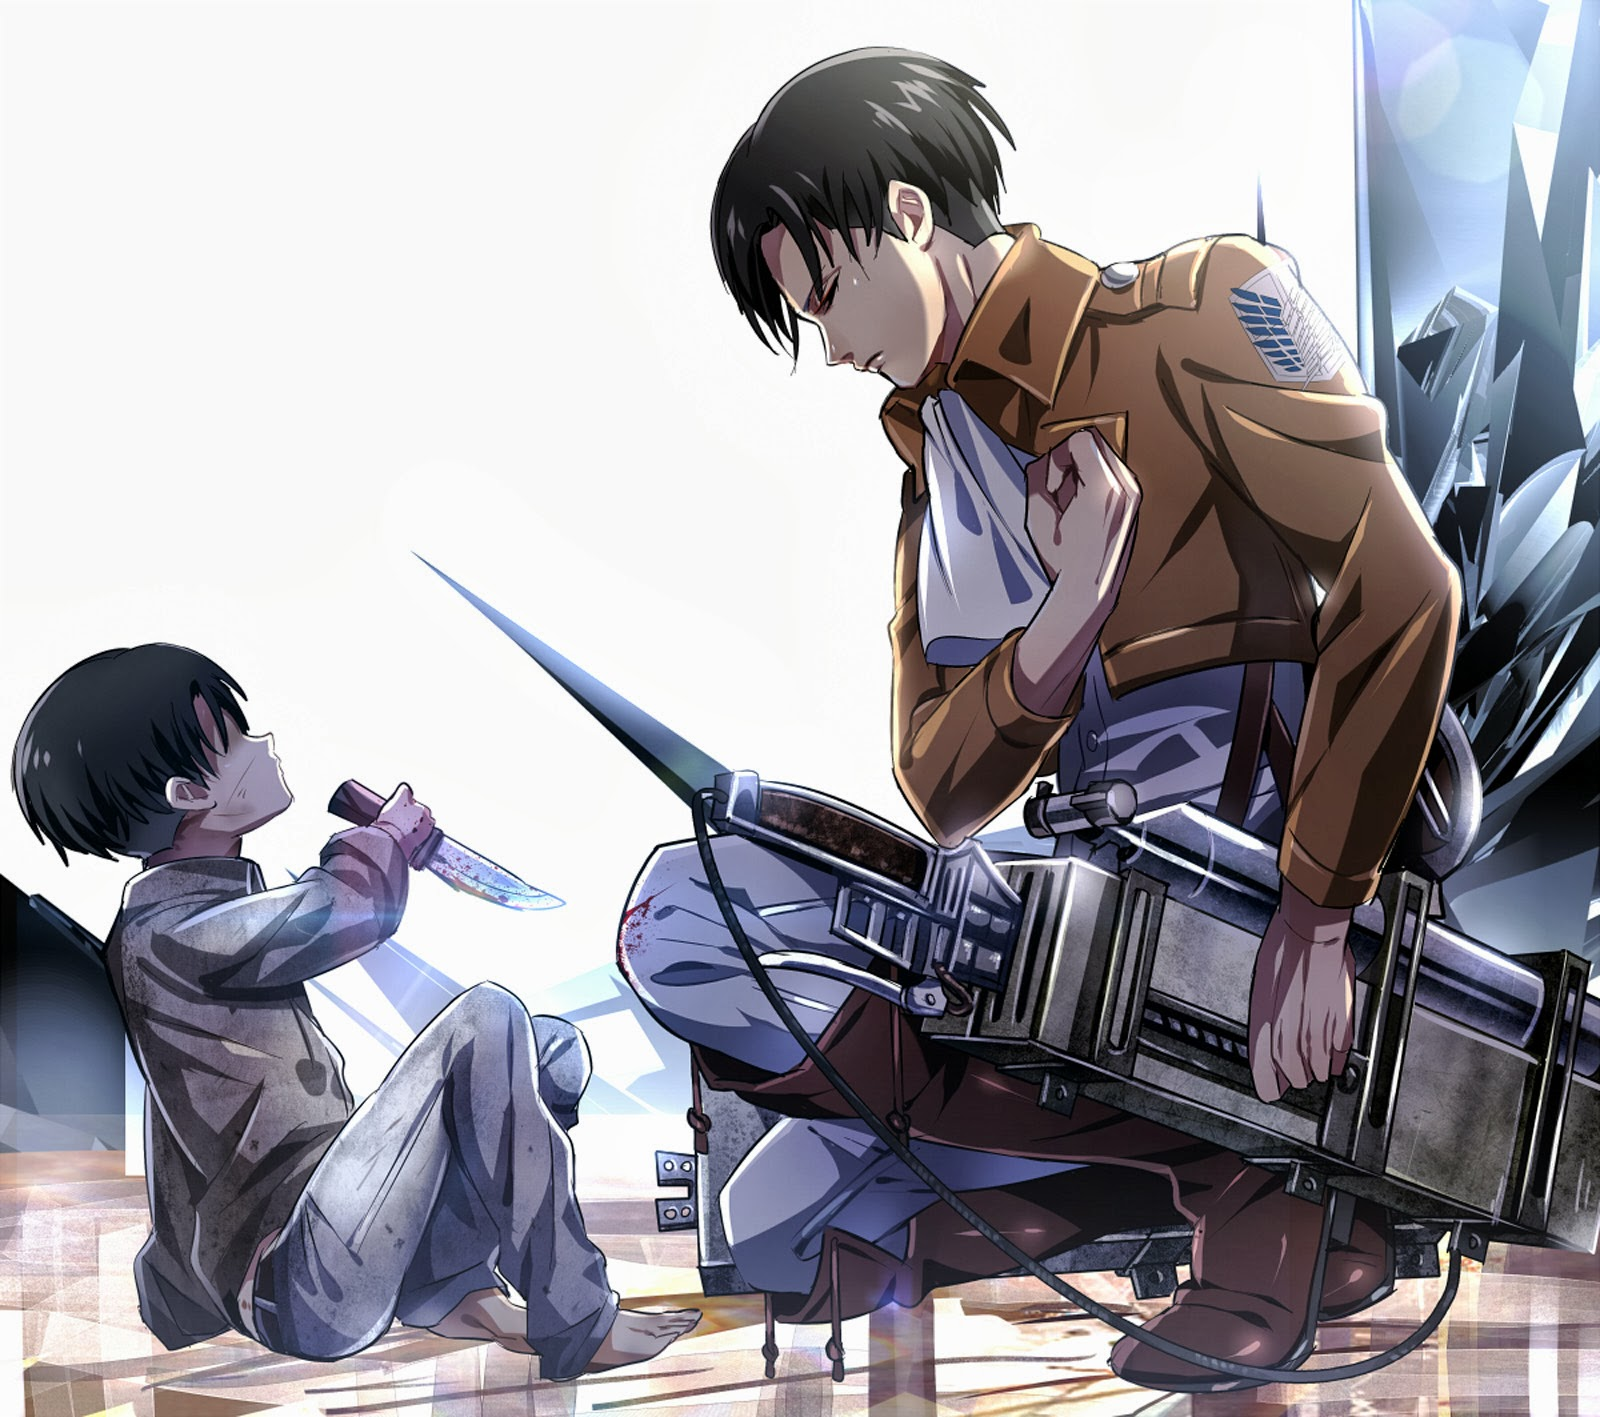 Attack on Titan Shingeki no Kyojin 3D Maneuver Gear Male Anime HD 1600x1417